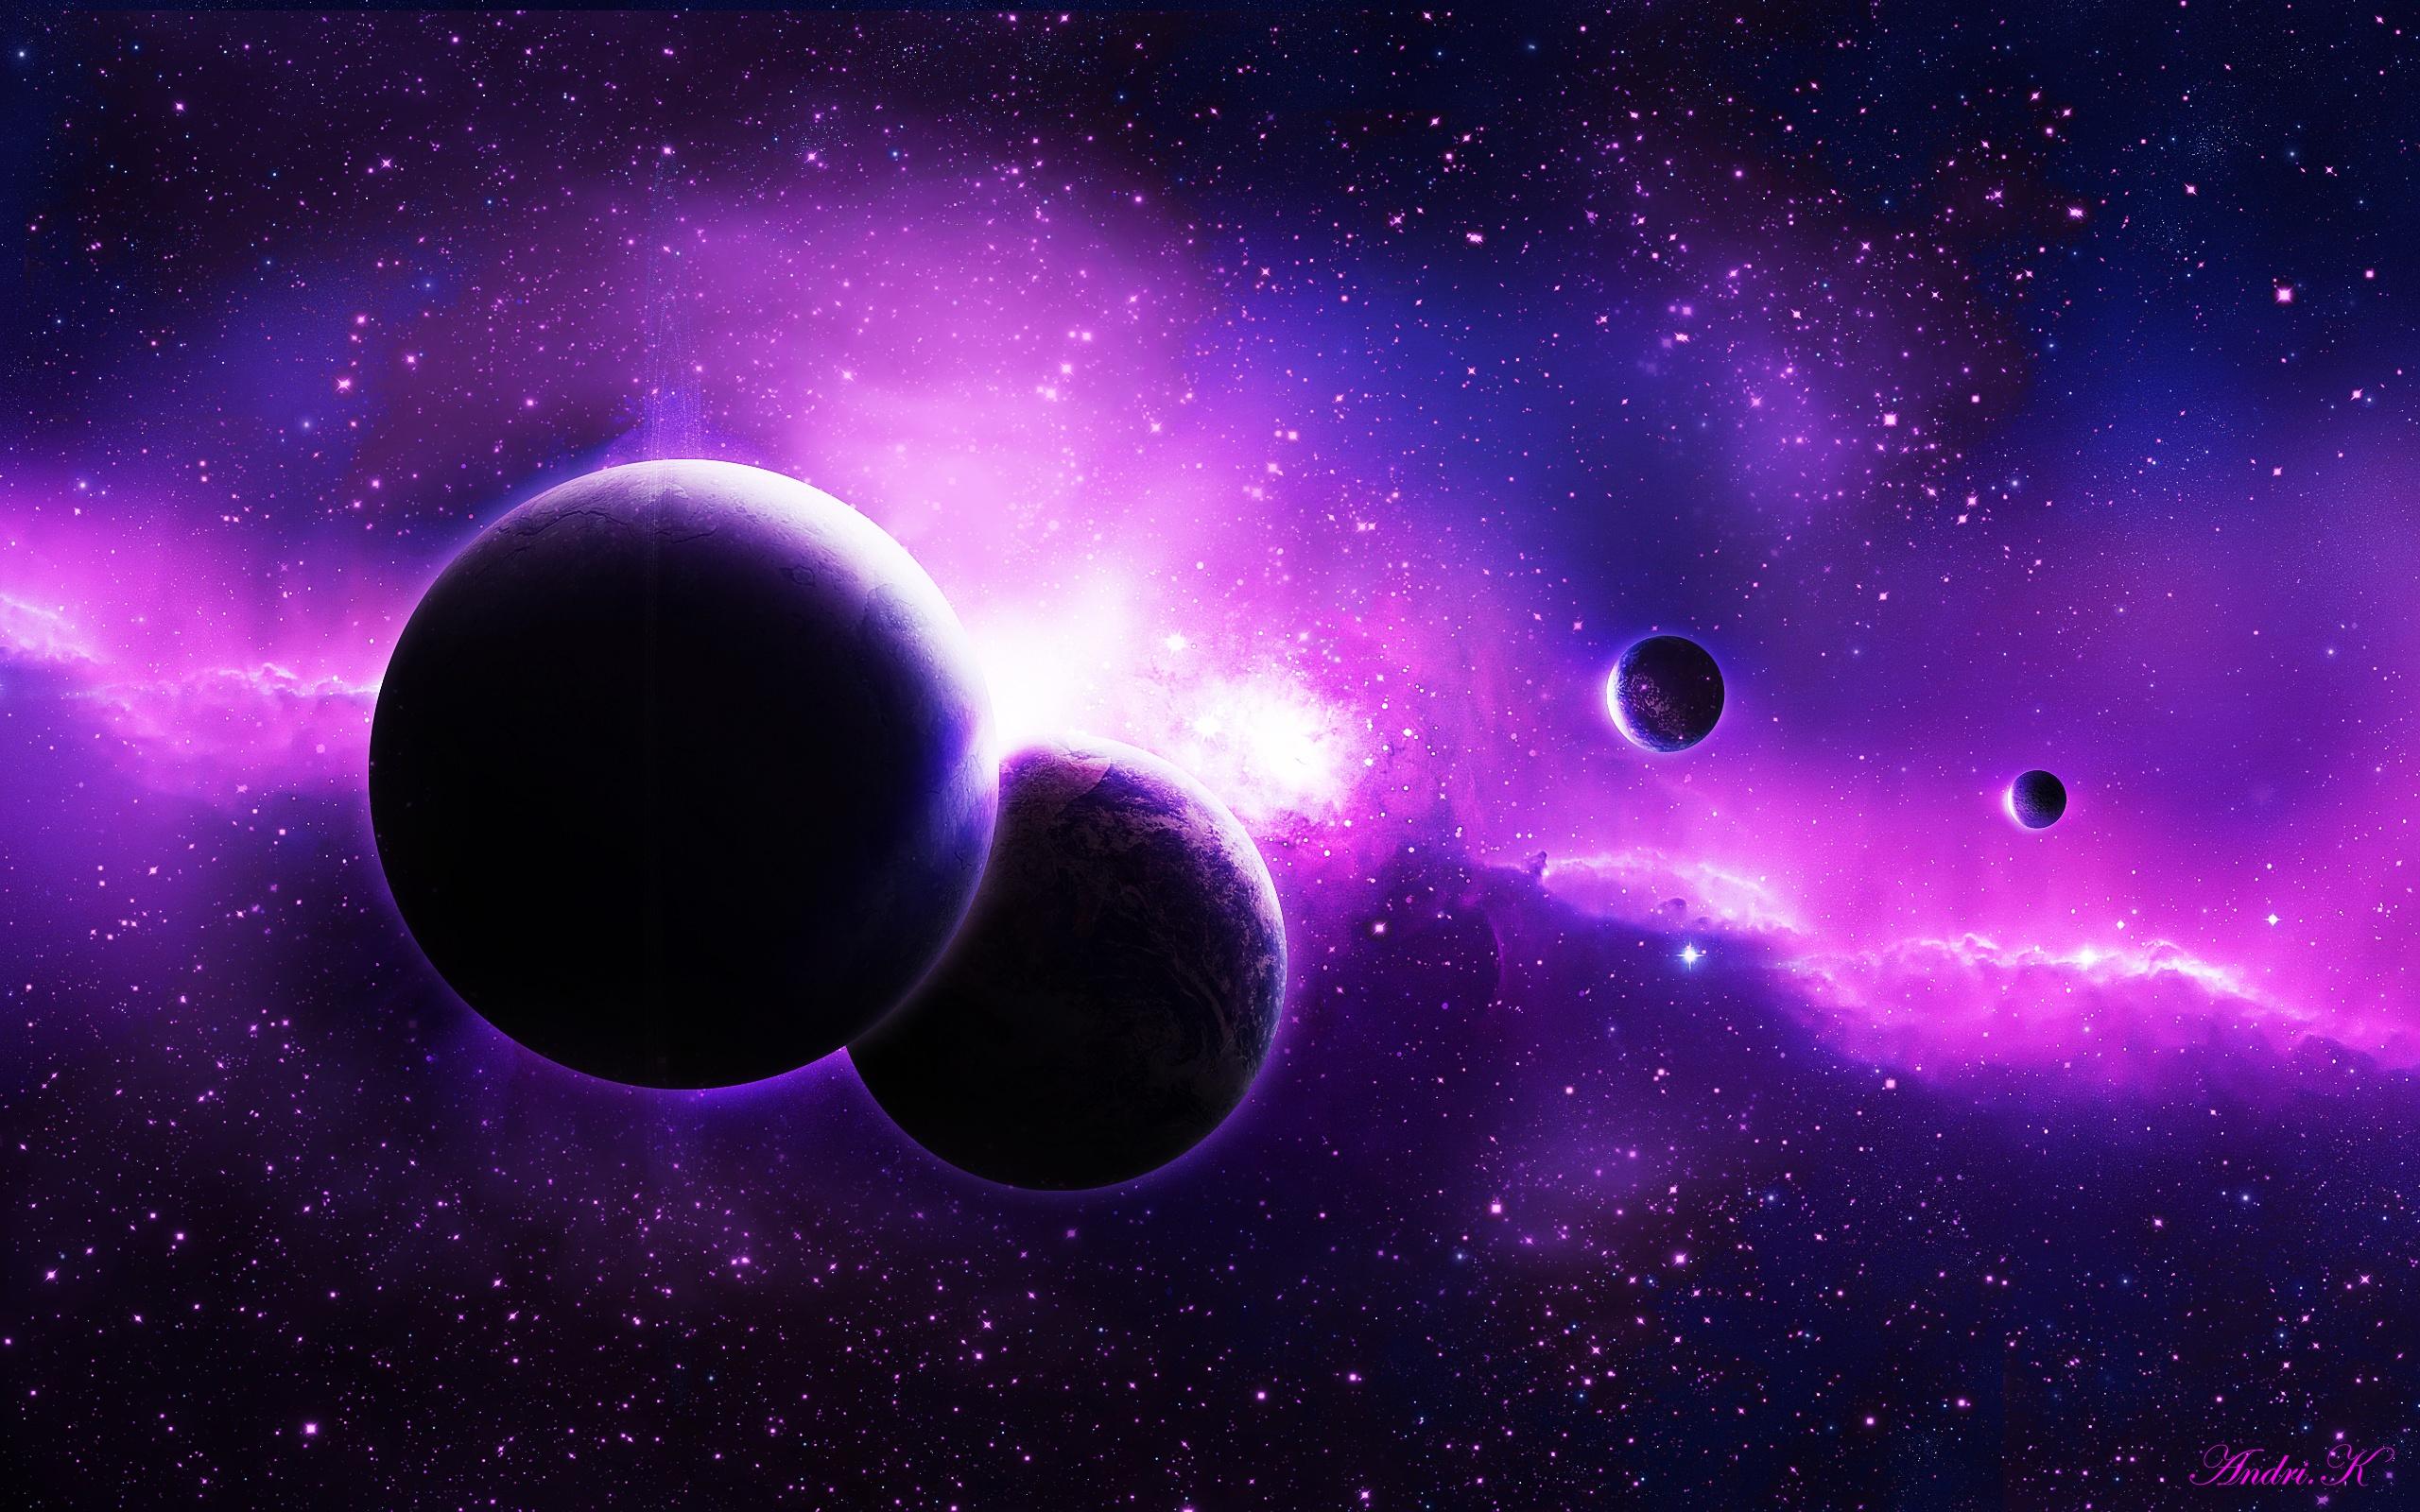 Purple Planets wallpaper download Purple Planets Purple Planets 2560x1600